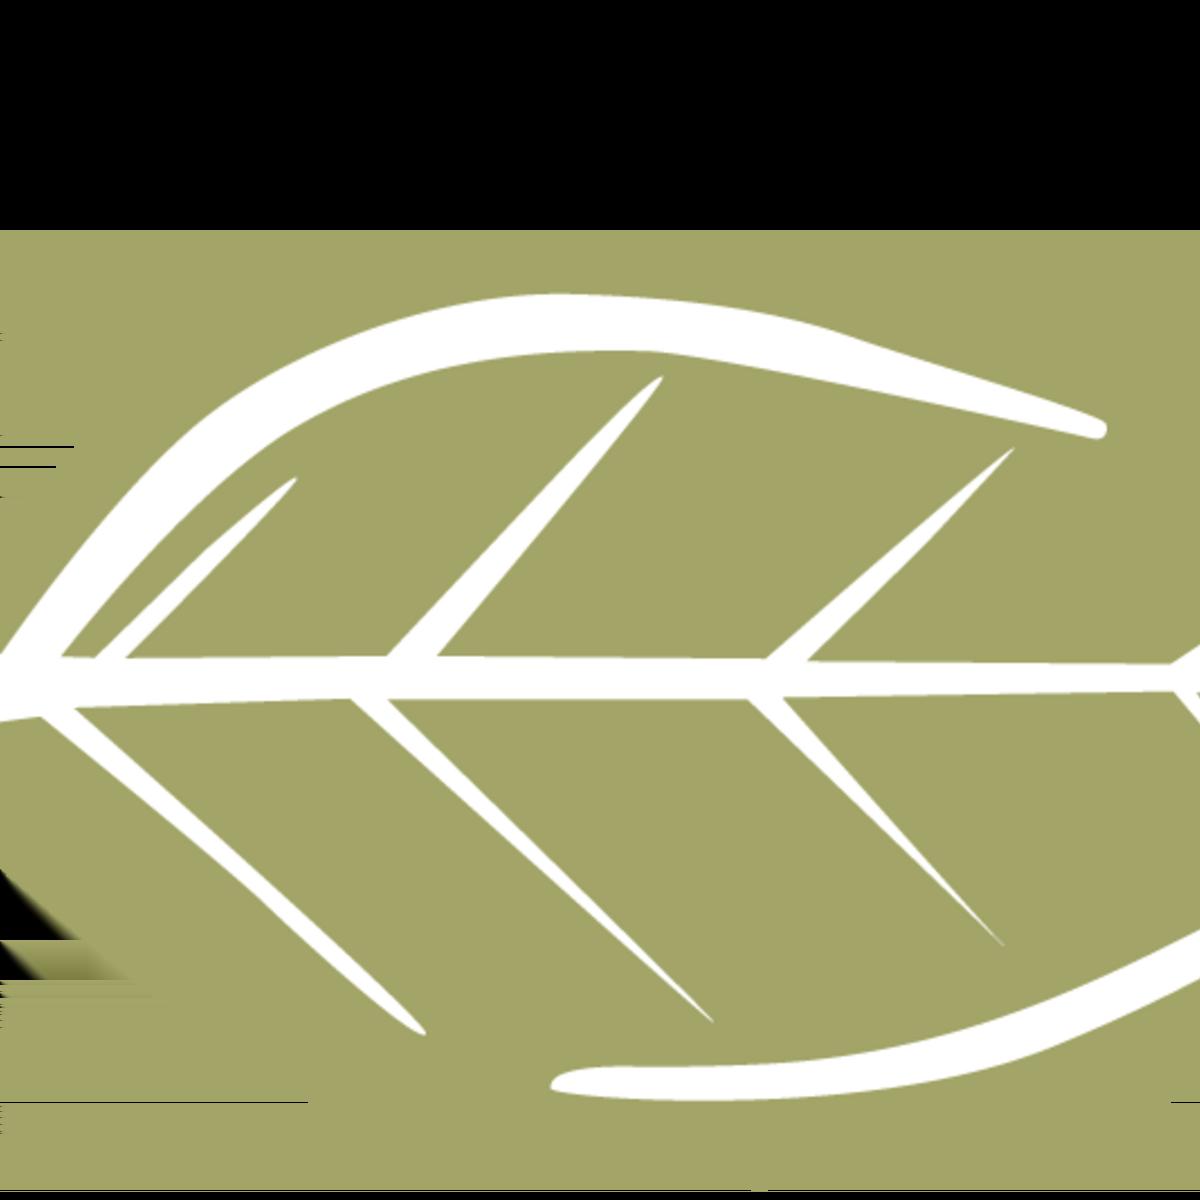 www.greenleaflotus.com